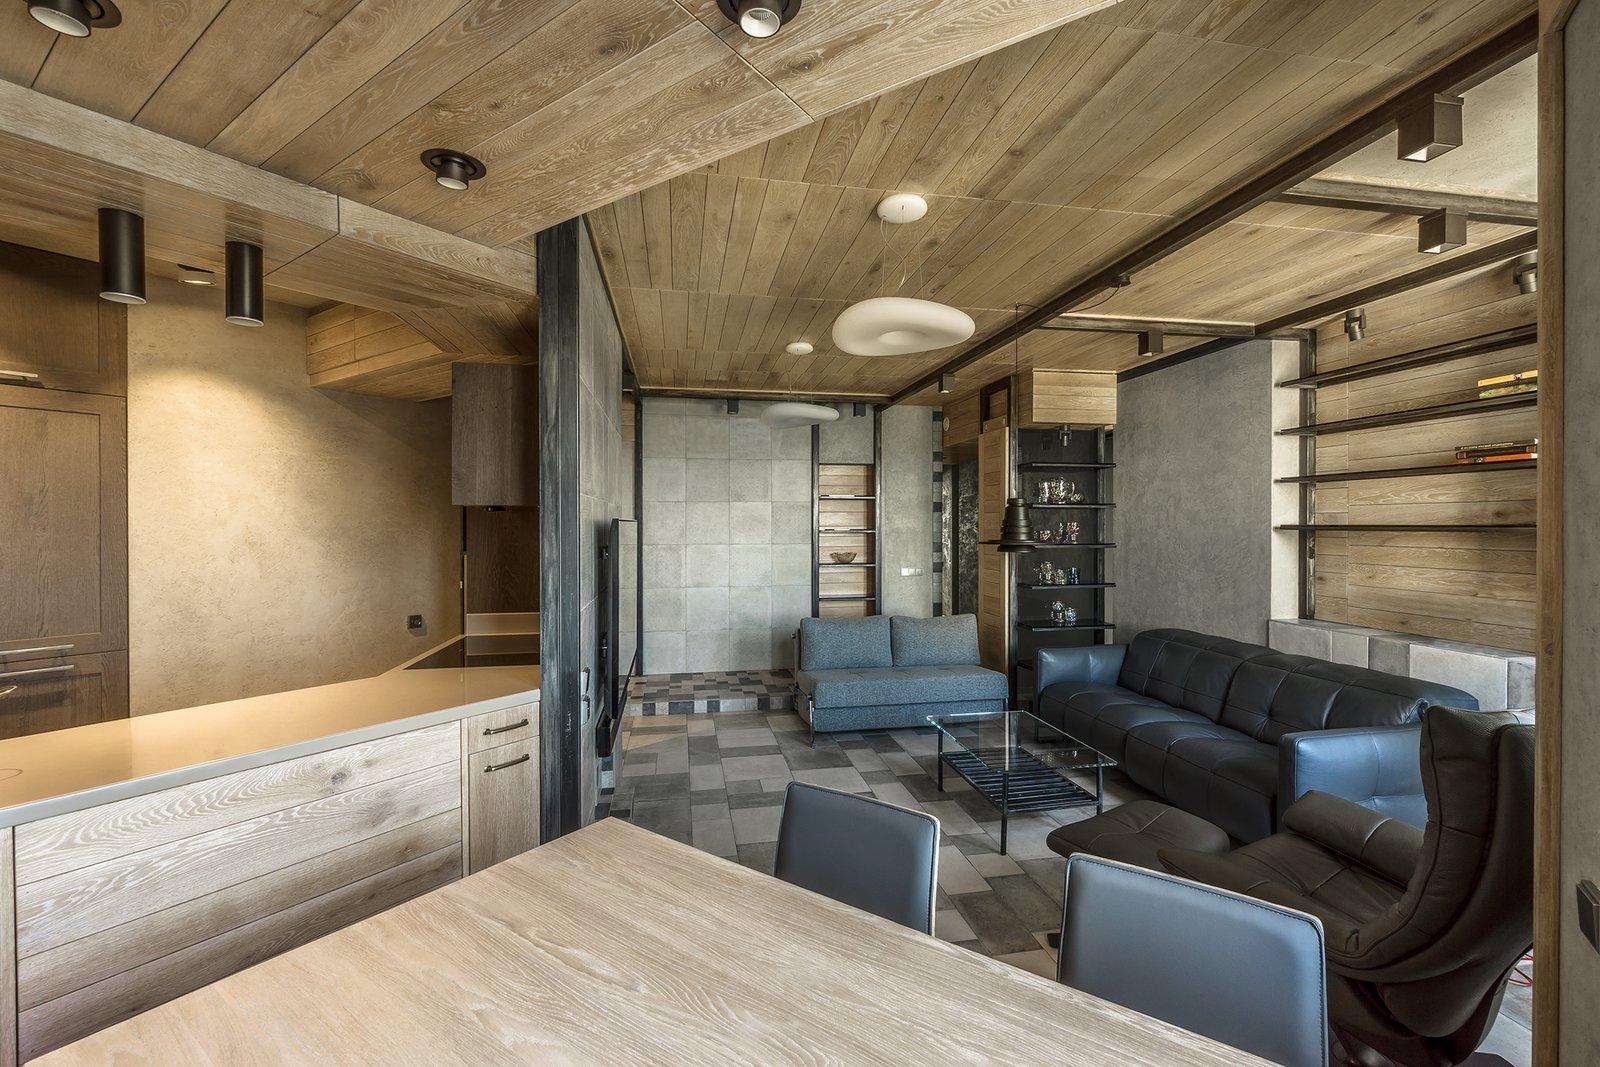 Living Room, Sofa, Coffee Tables, Chair, Ceiling Lighting, Pendant Lighting, and Ceramic Tile Floor Living room  NagatinSky by Alexey Rozenberg